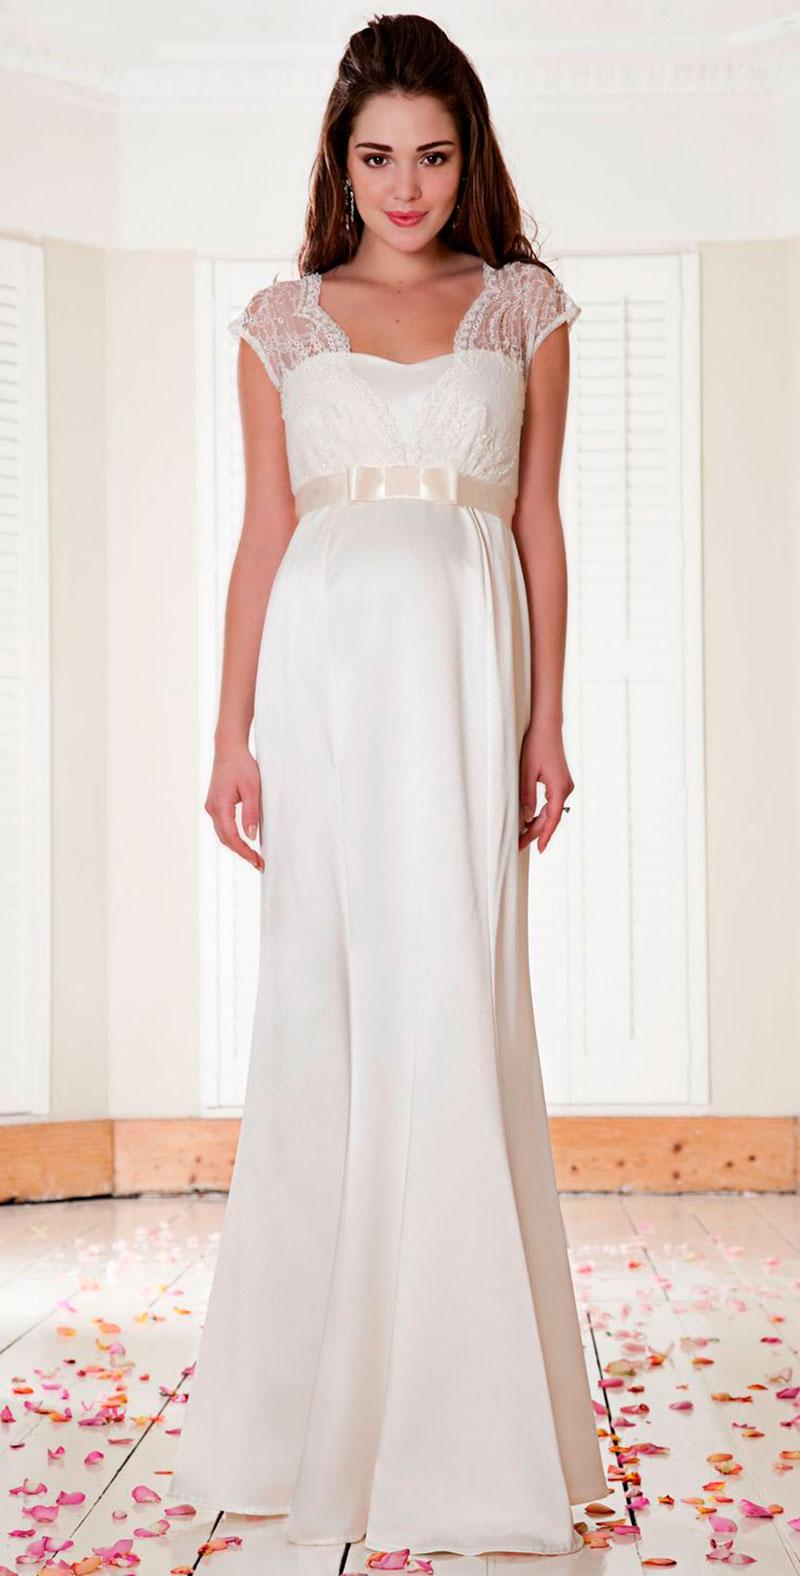 Vestido de noiva para gestante meigo